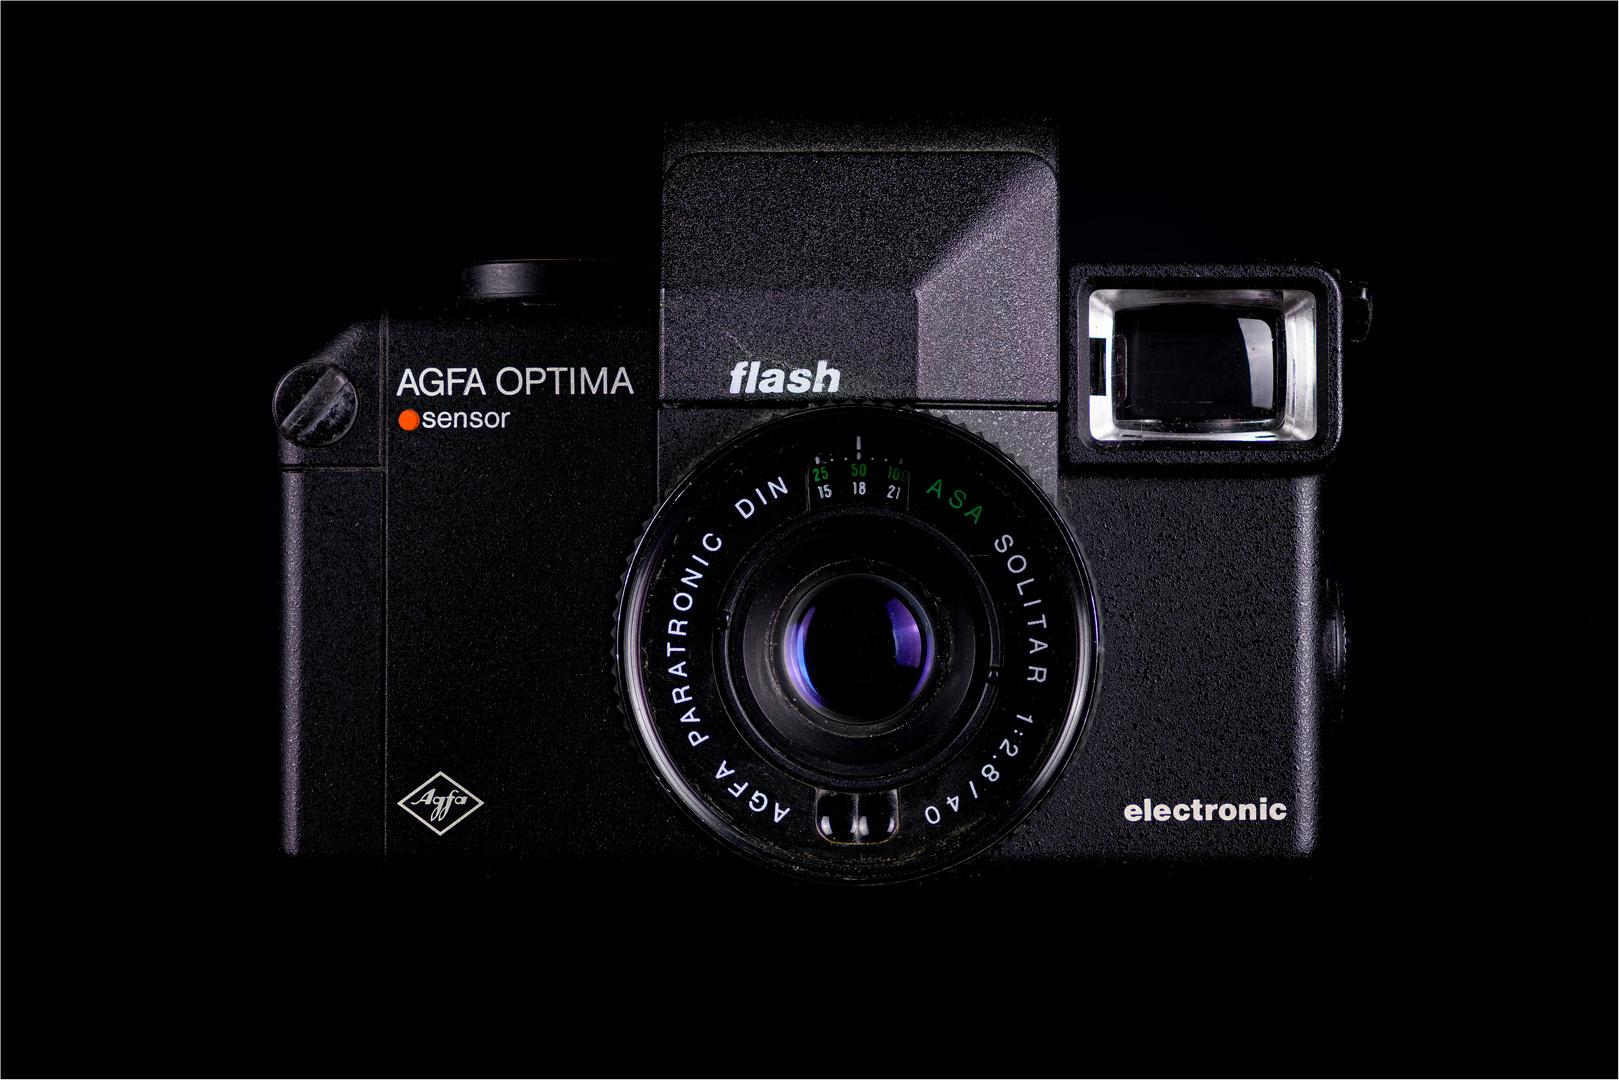 AGFA Optima Sensor electronic flash